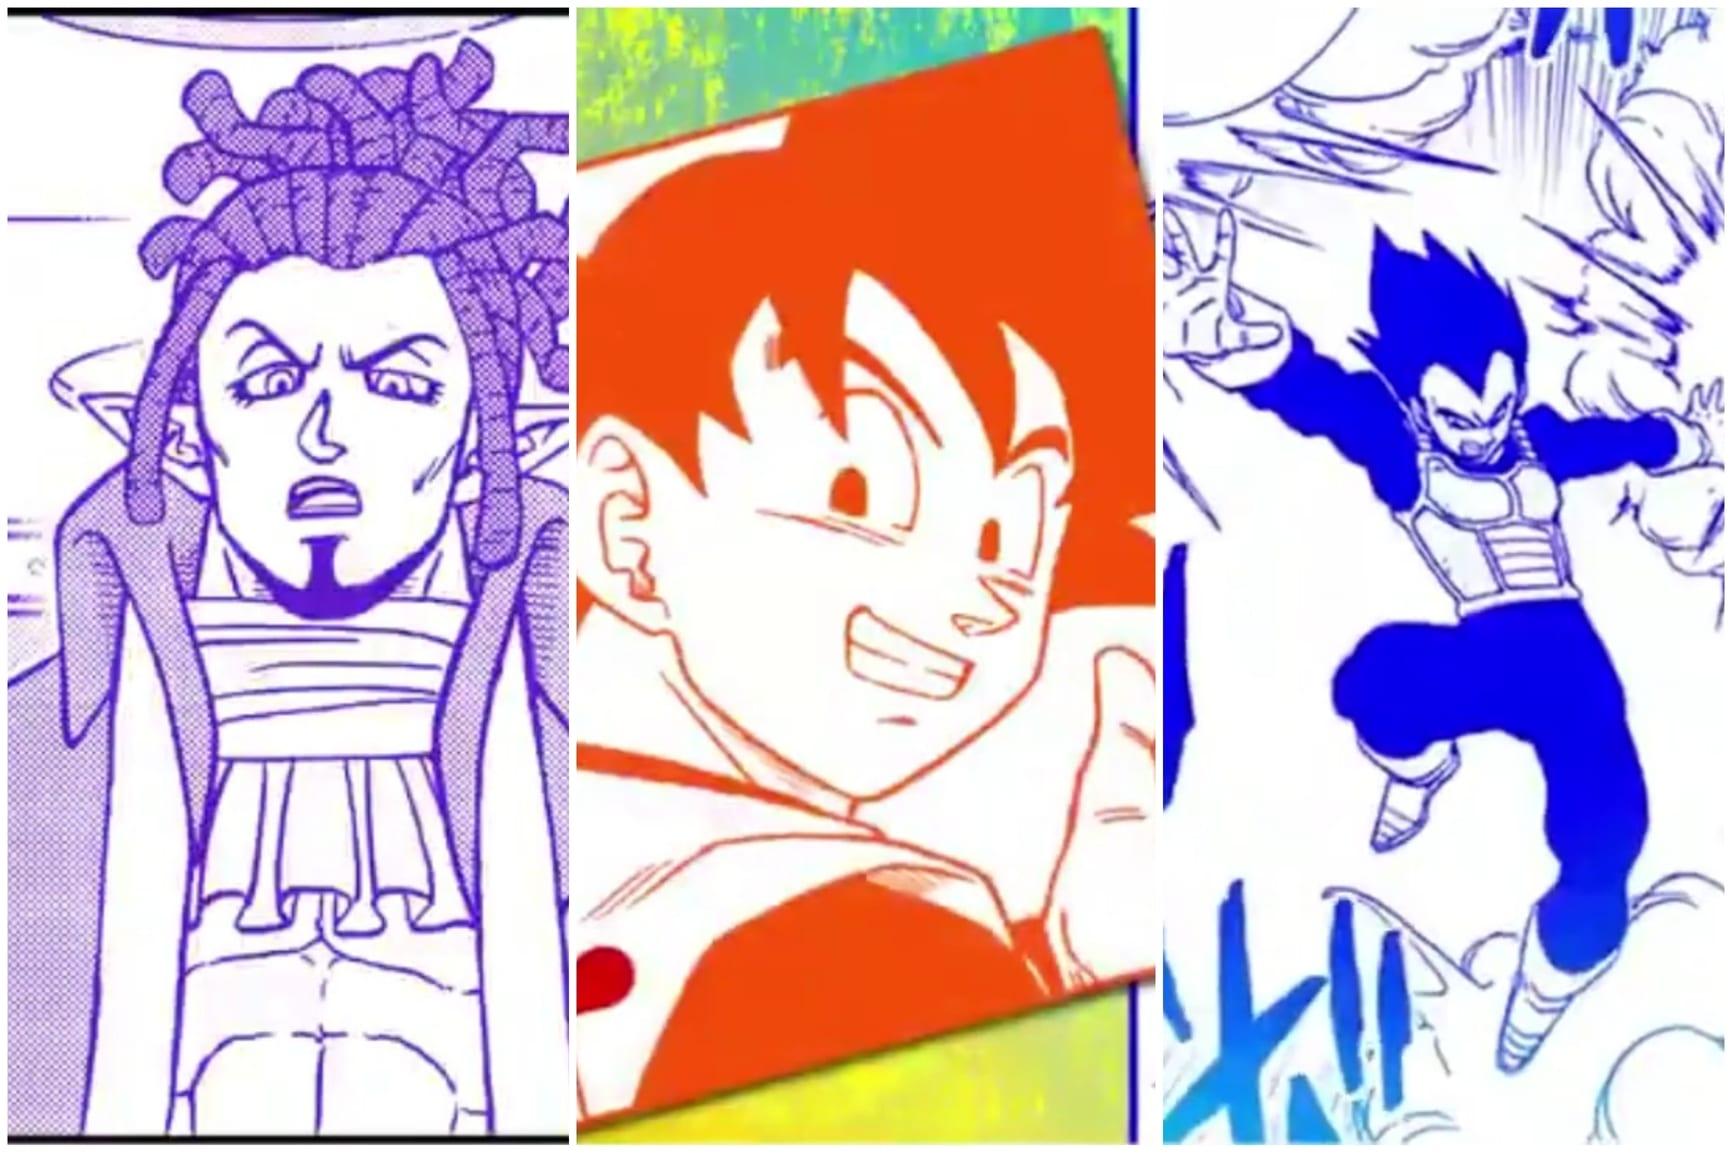 Dragon Ball Super Manga Chapter 71 Spoilers